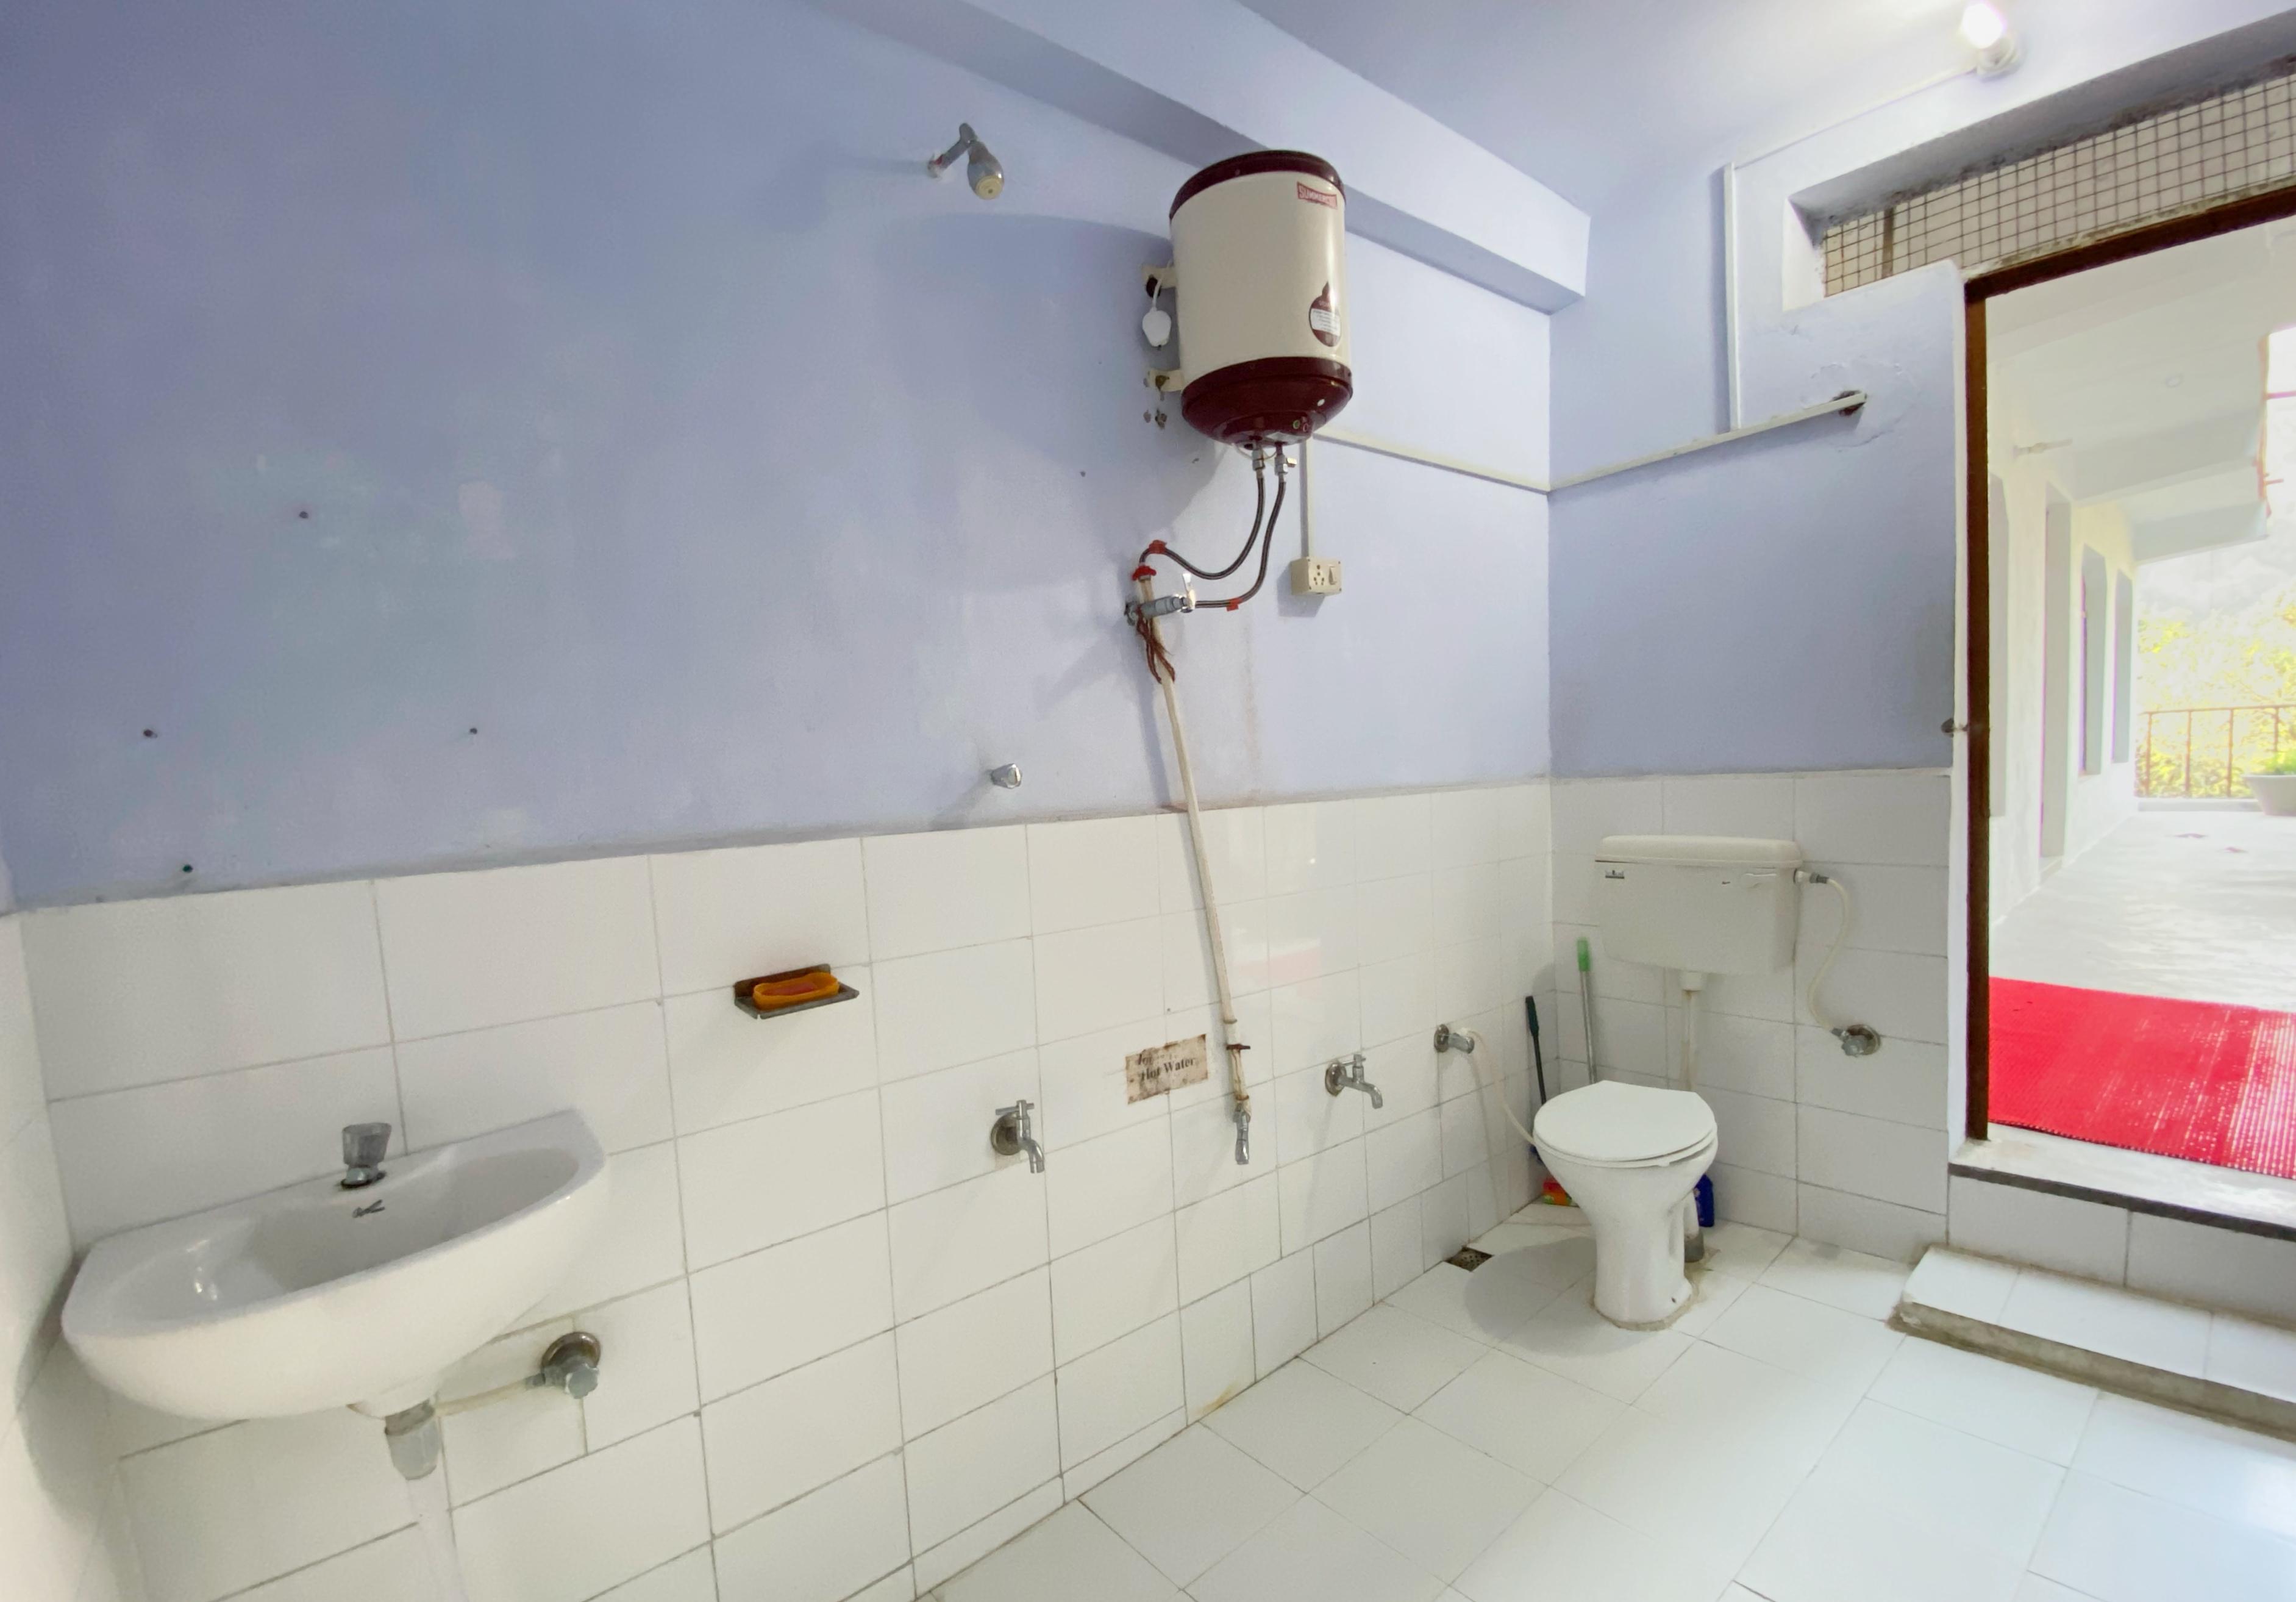 Shared bathroom at Phool Chatti Yoga Ashram in Rishikesh